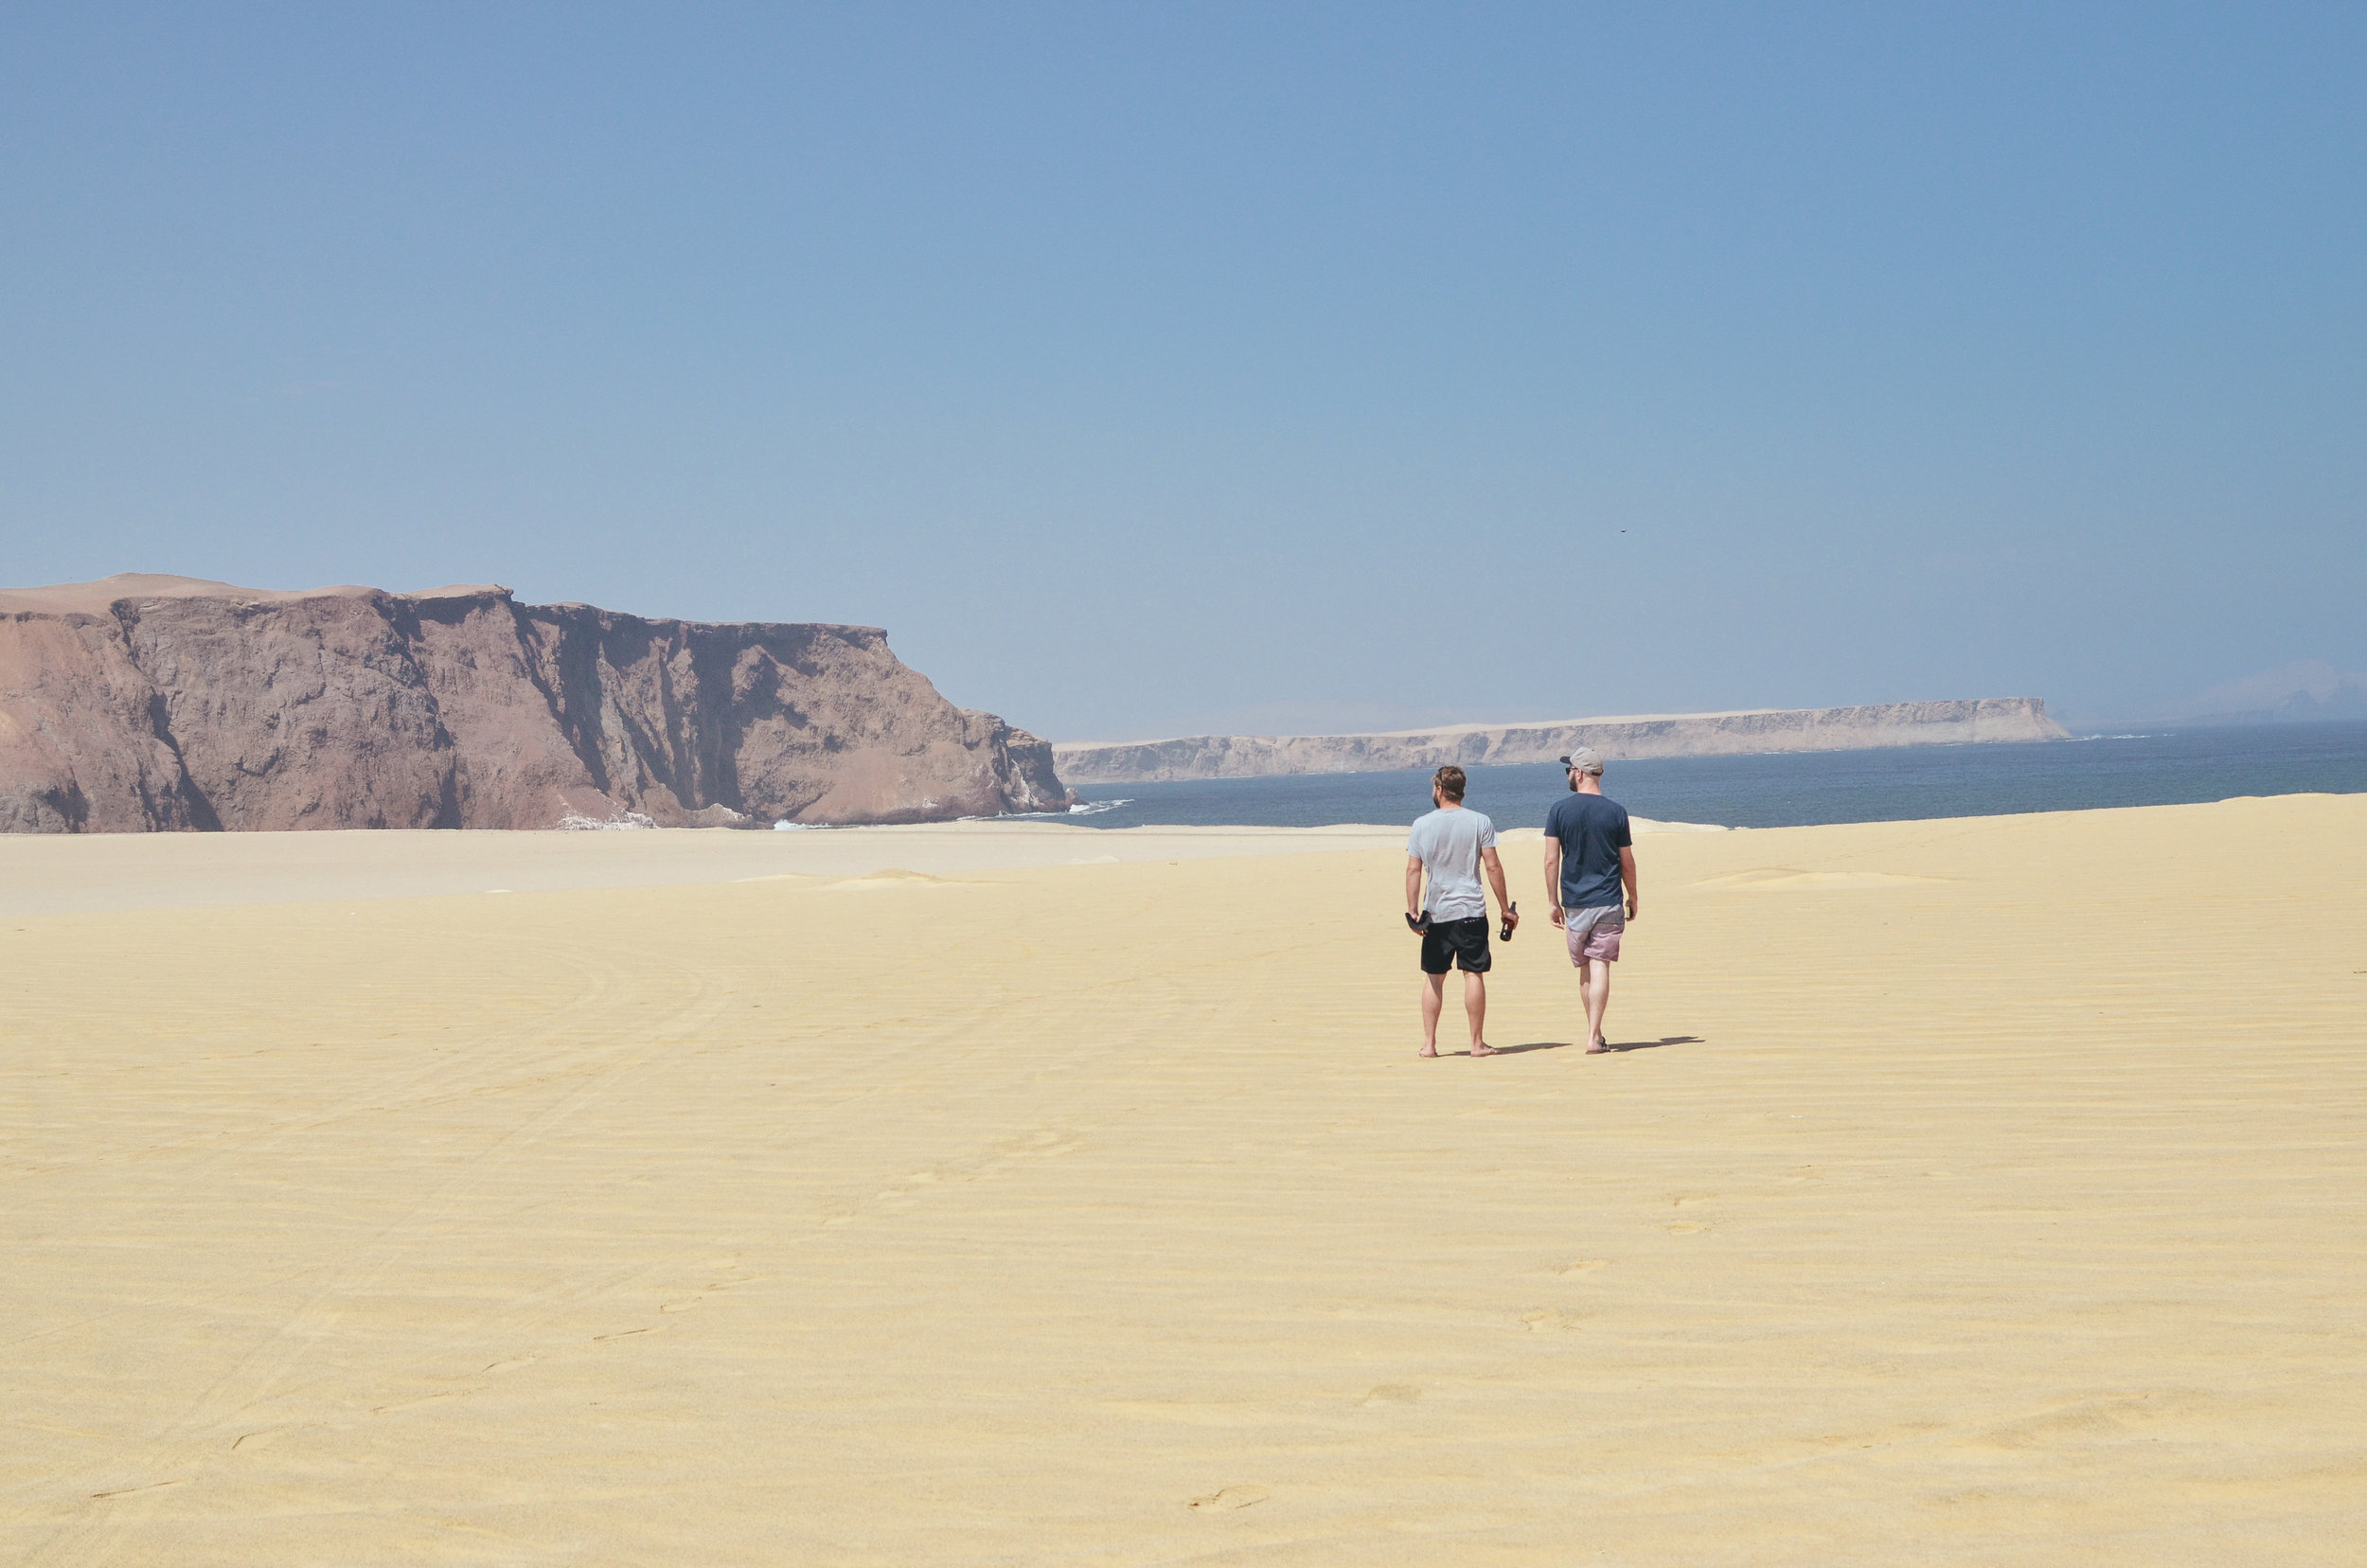 paracas+peru+travel+guide+life+on+pine_DSC_1978.jpg